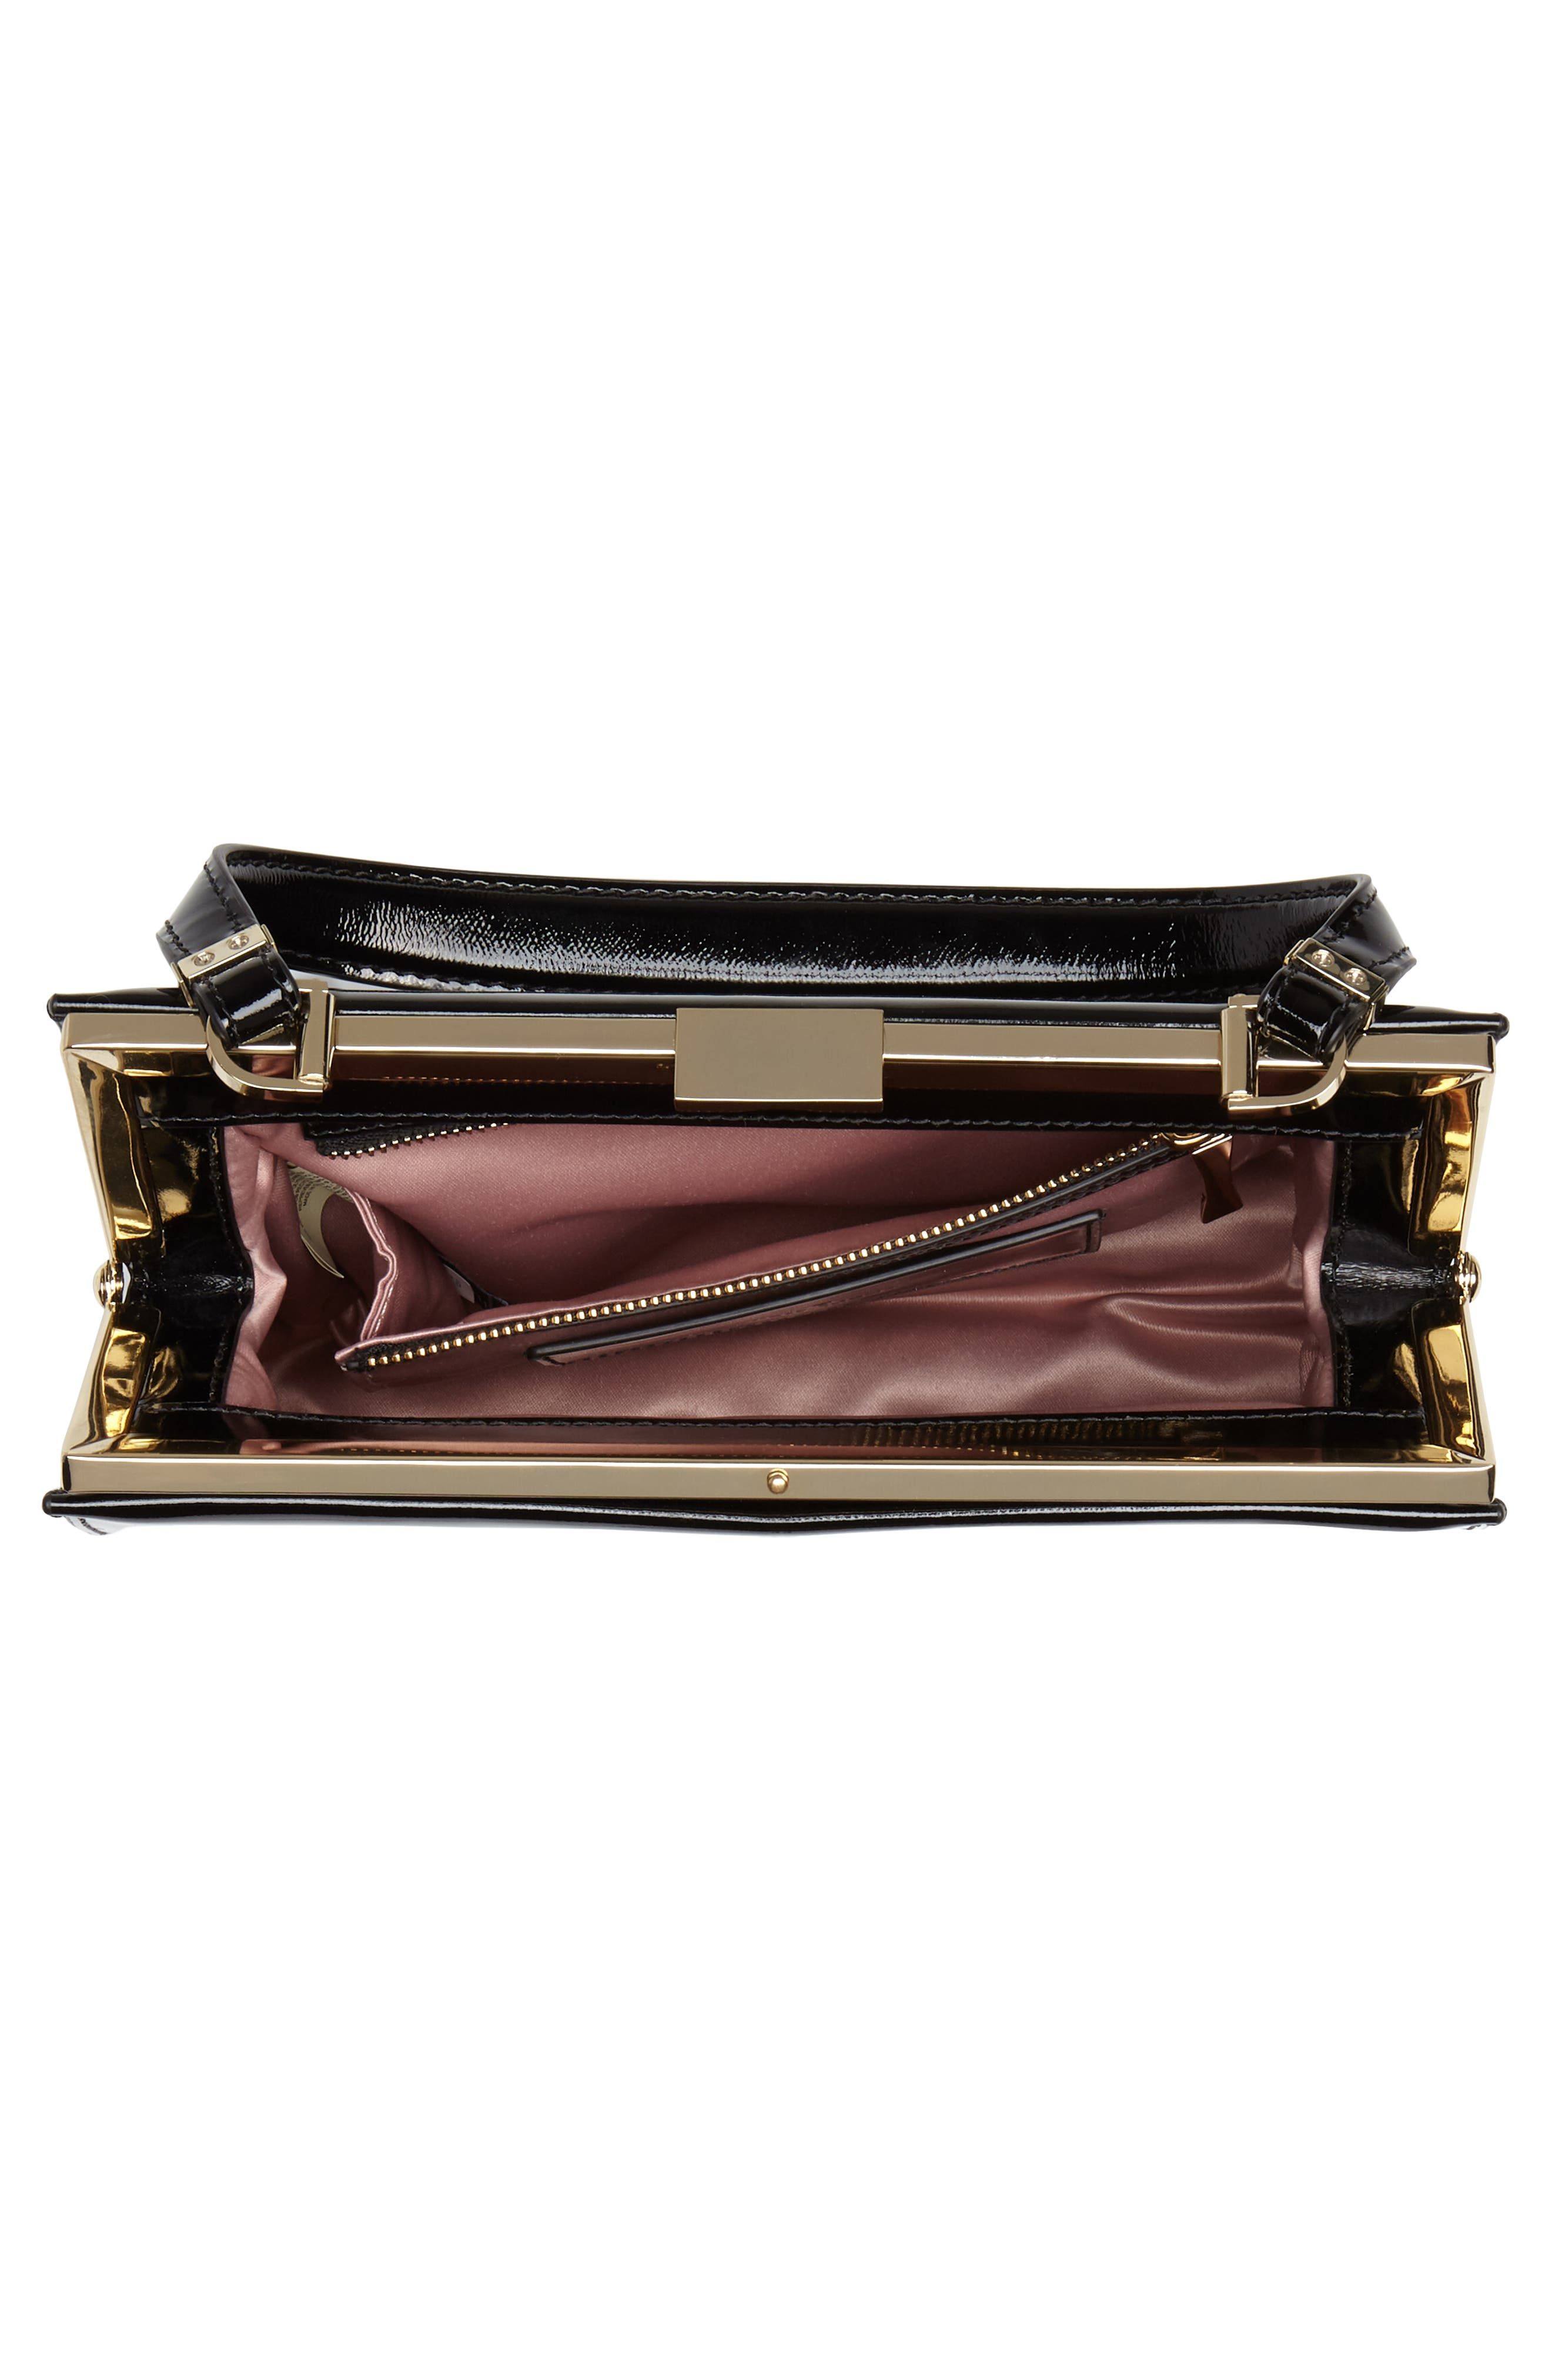 KATE SPADE NEW YORK,                             madison moore road - chari leather handbag,                             Alternate thumbnail 4, color,                             001